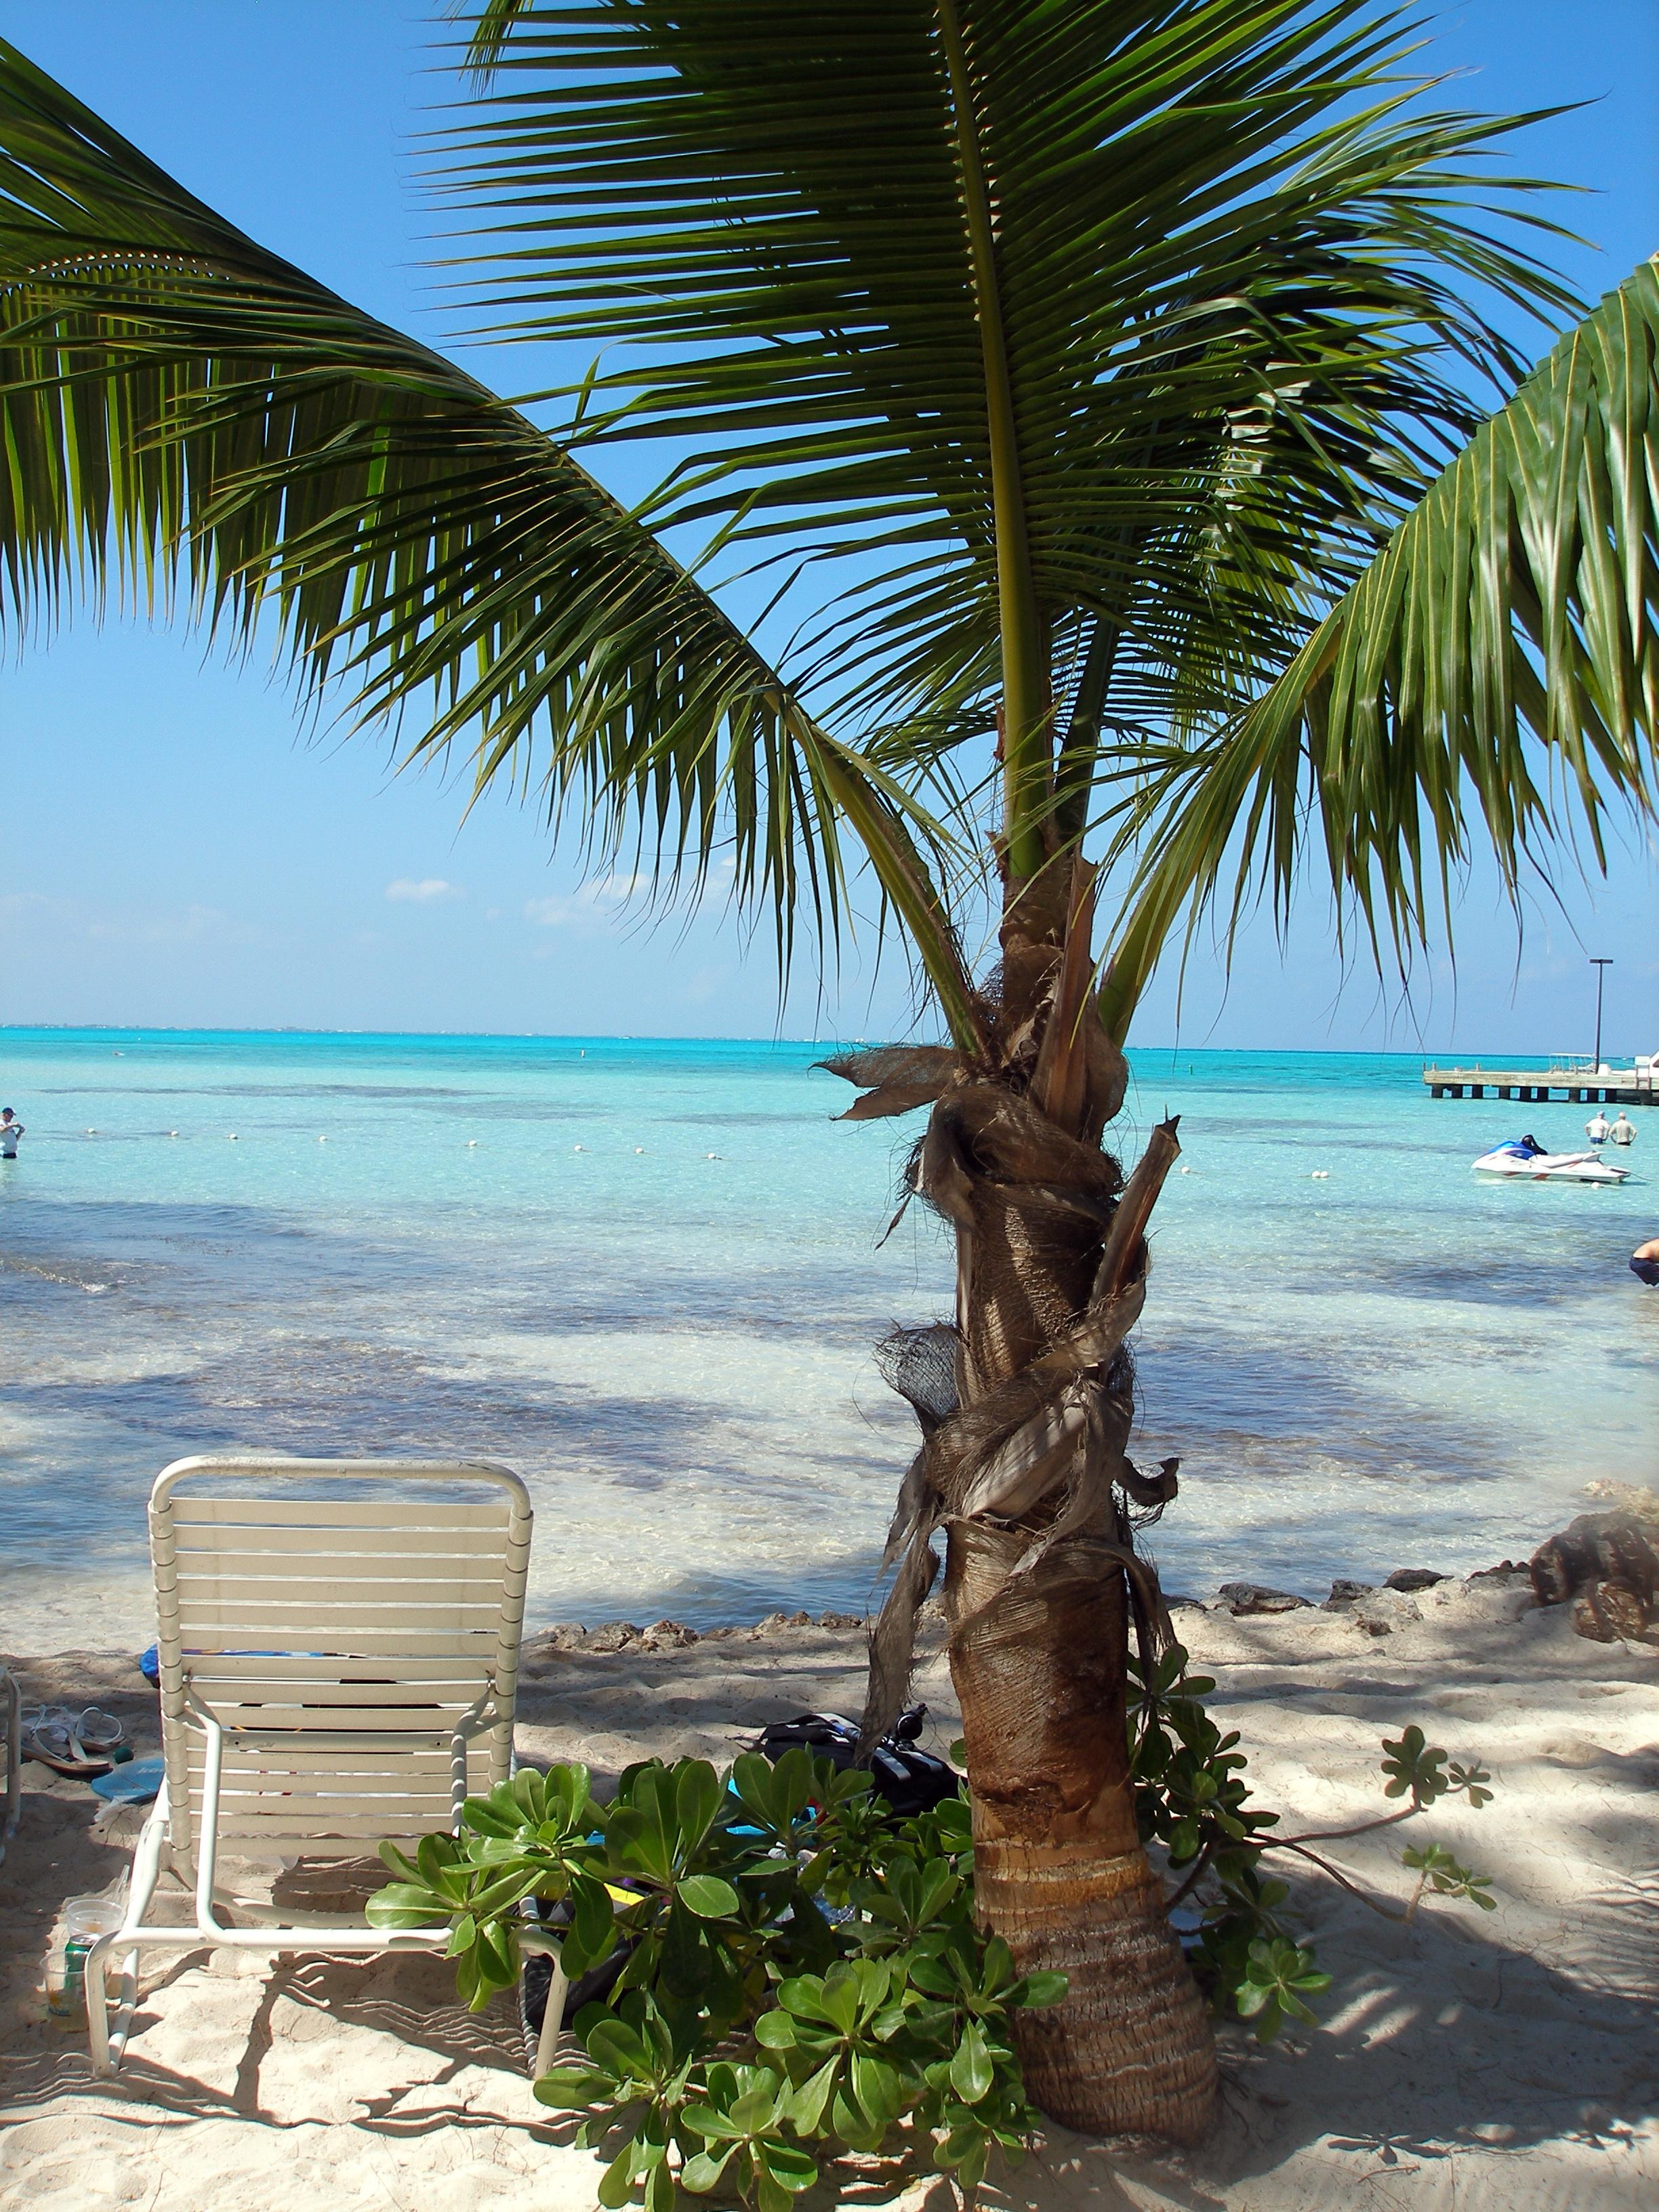 The Beach in Cayman Islands